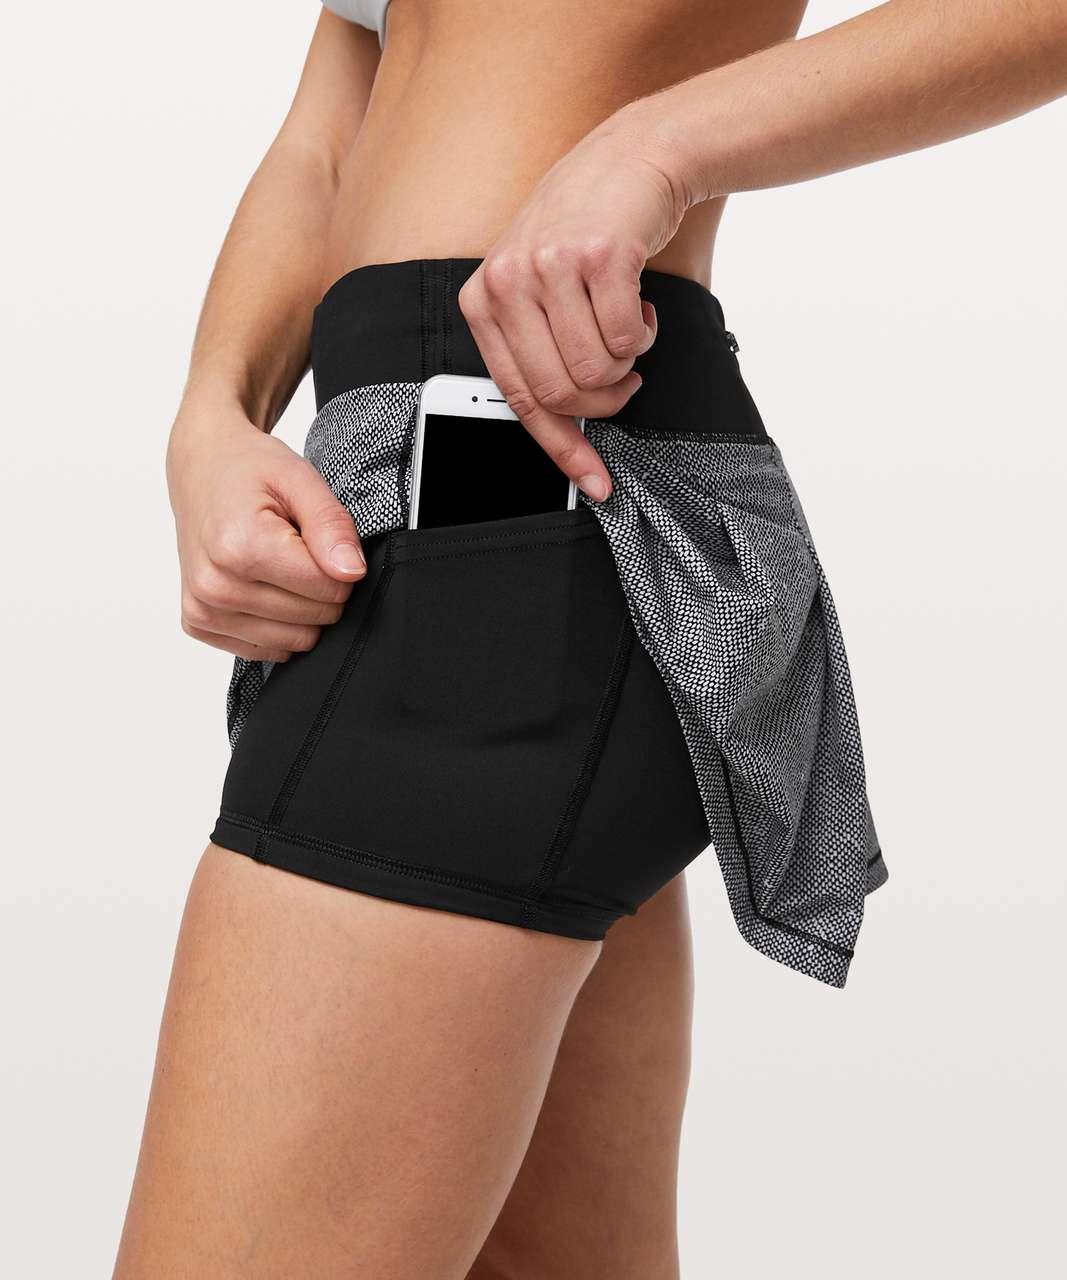 Lululemon Pace Rival Skirt II (Regular) *4-way Stretch - Dotscape Alpine White Black / Black